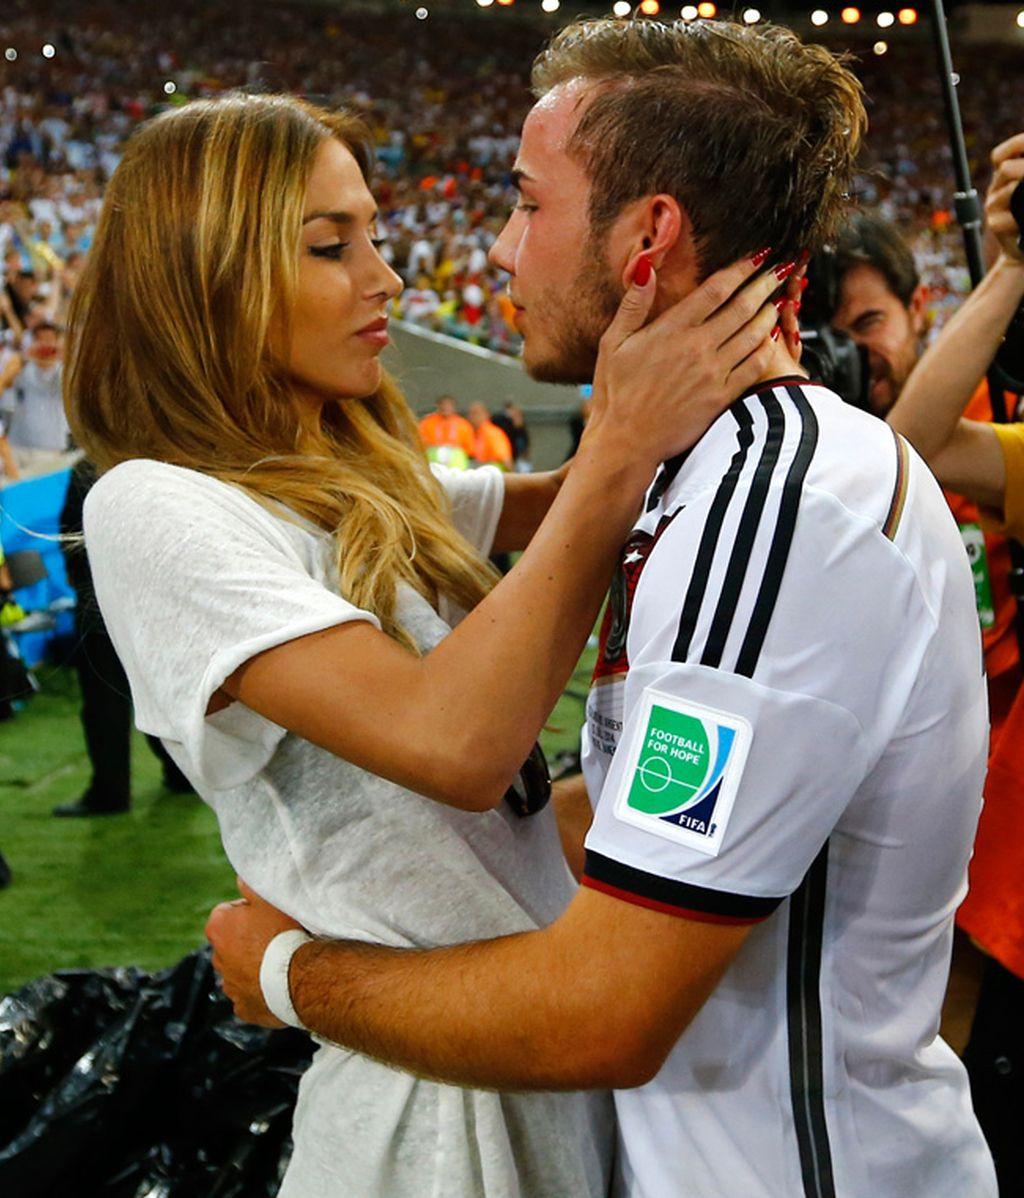 El goleador Götze fue a buscar a su novia Ann-Kathrin